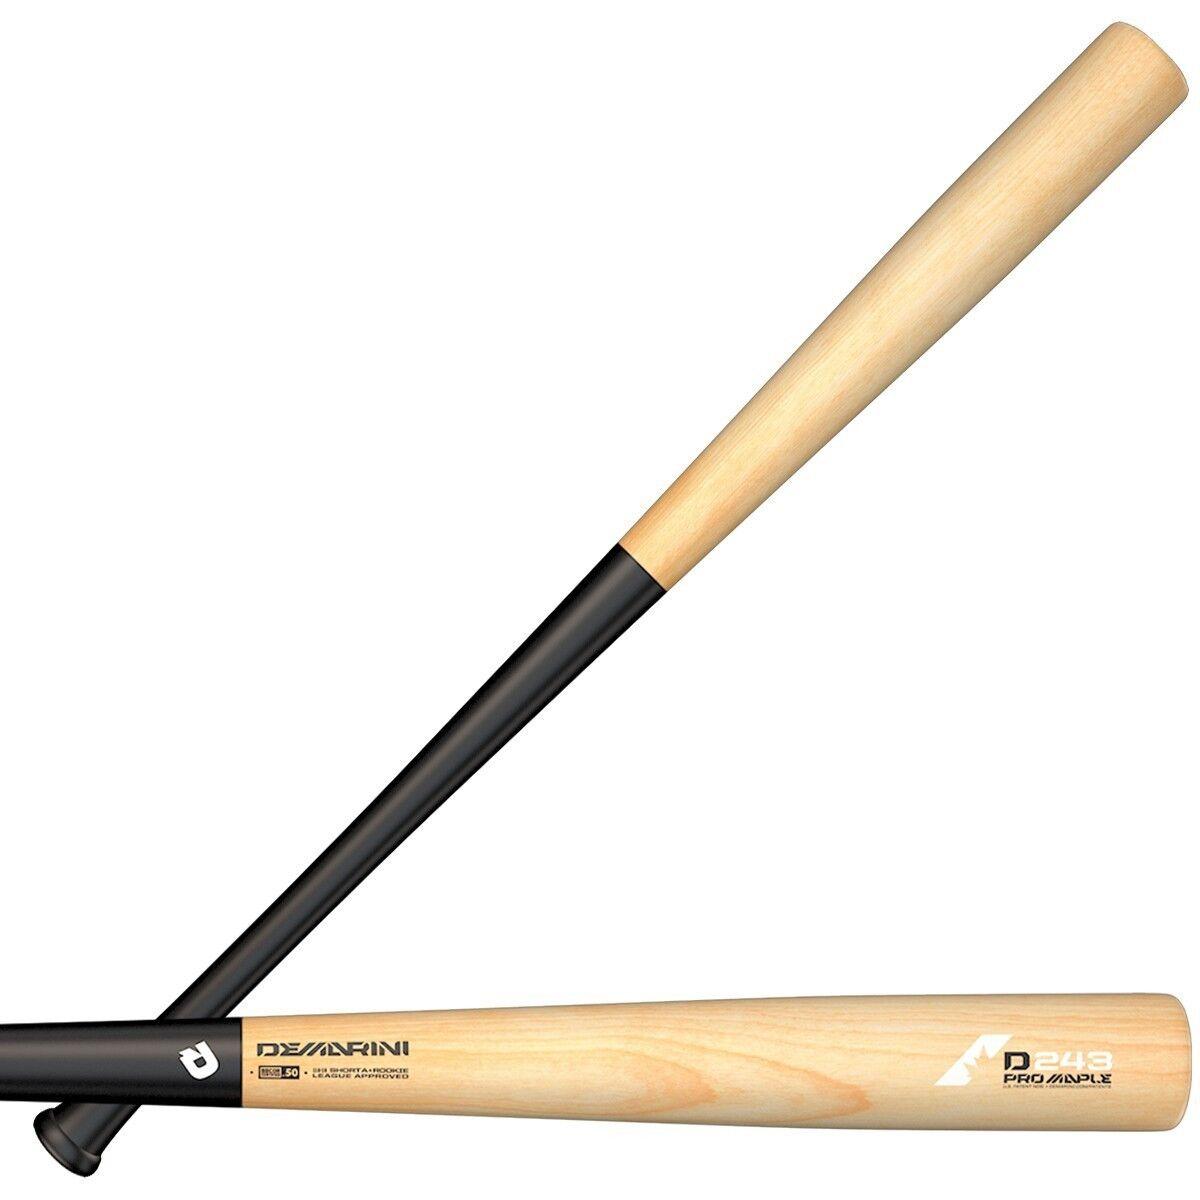 NEW 2019 DeMarini D243 Pro Pro D243 Maple Wood Composite Baseball Bat 31